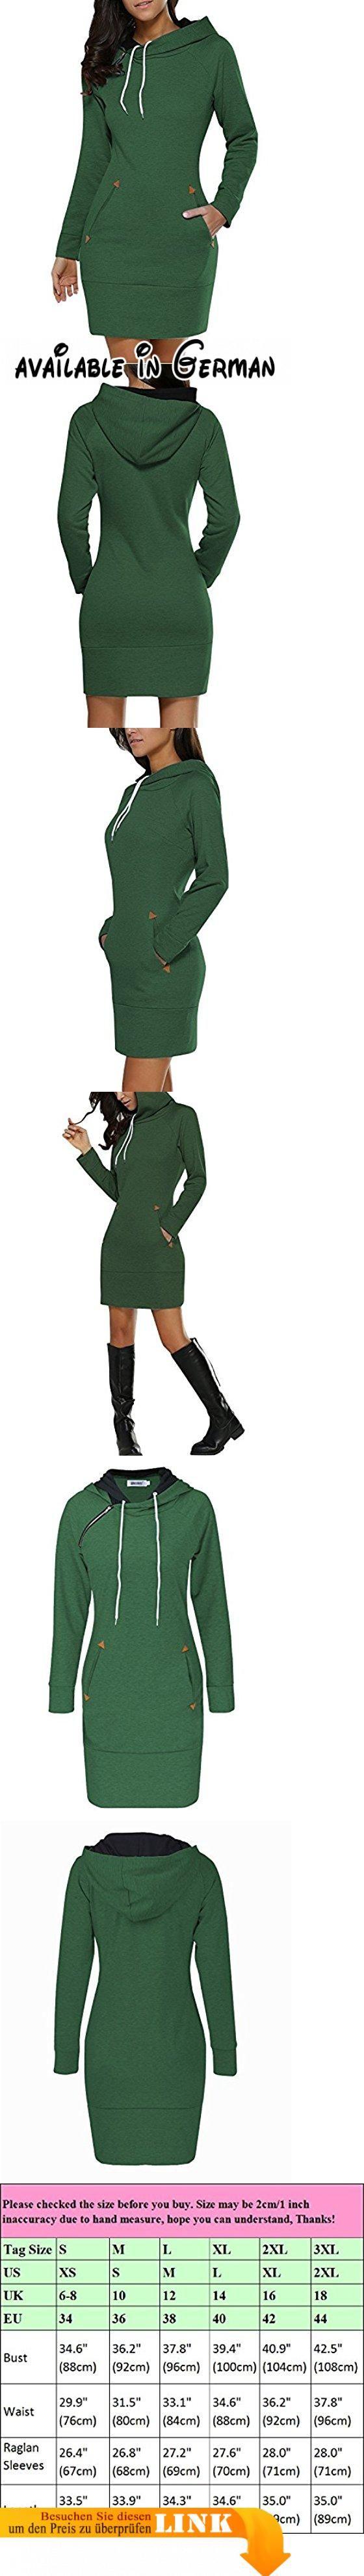 BIUBIU Damen Mode Hoodie mit Zip Langarm Pullover Jumper Pulli Sweatshirt Jumper Grün DE 42.  #Apparel #OUTERWEAR